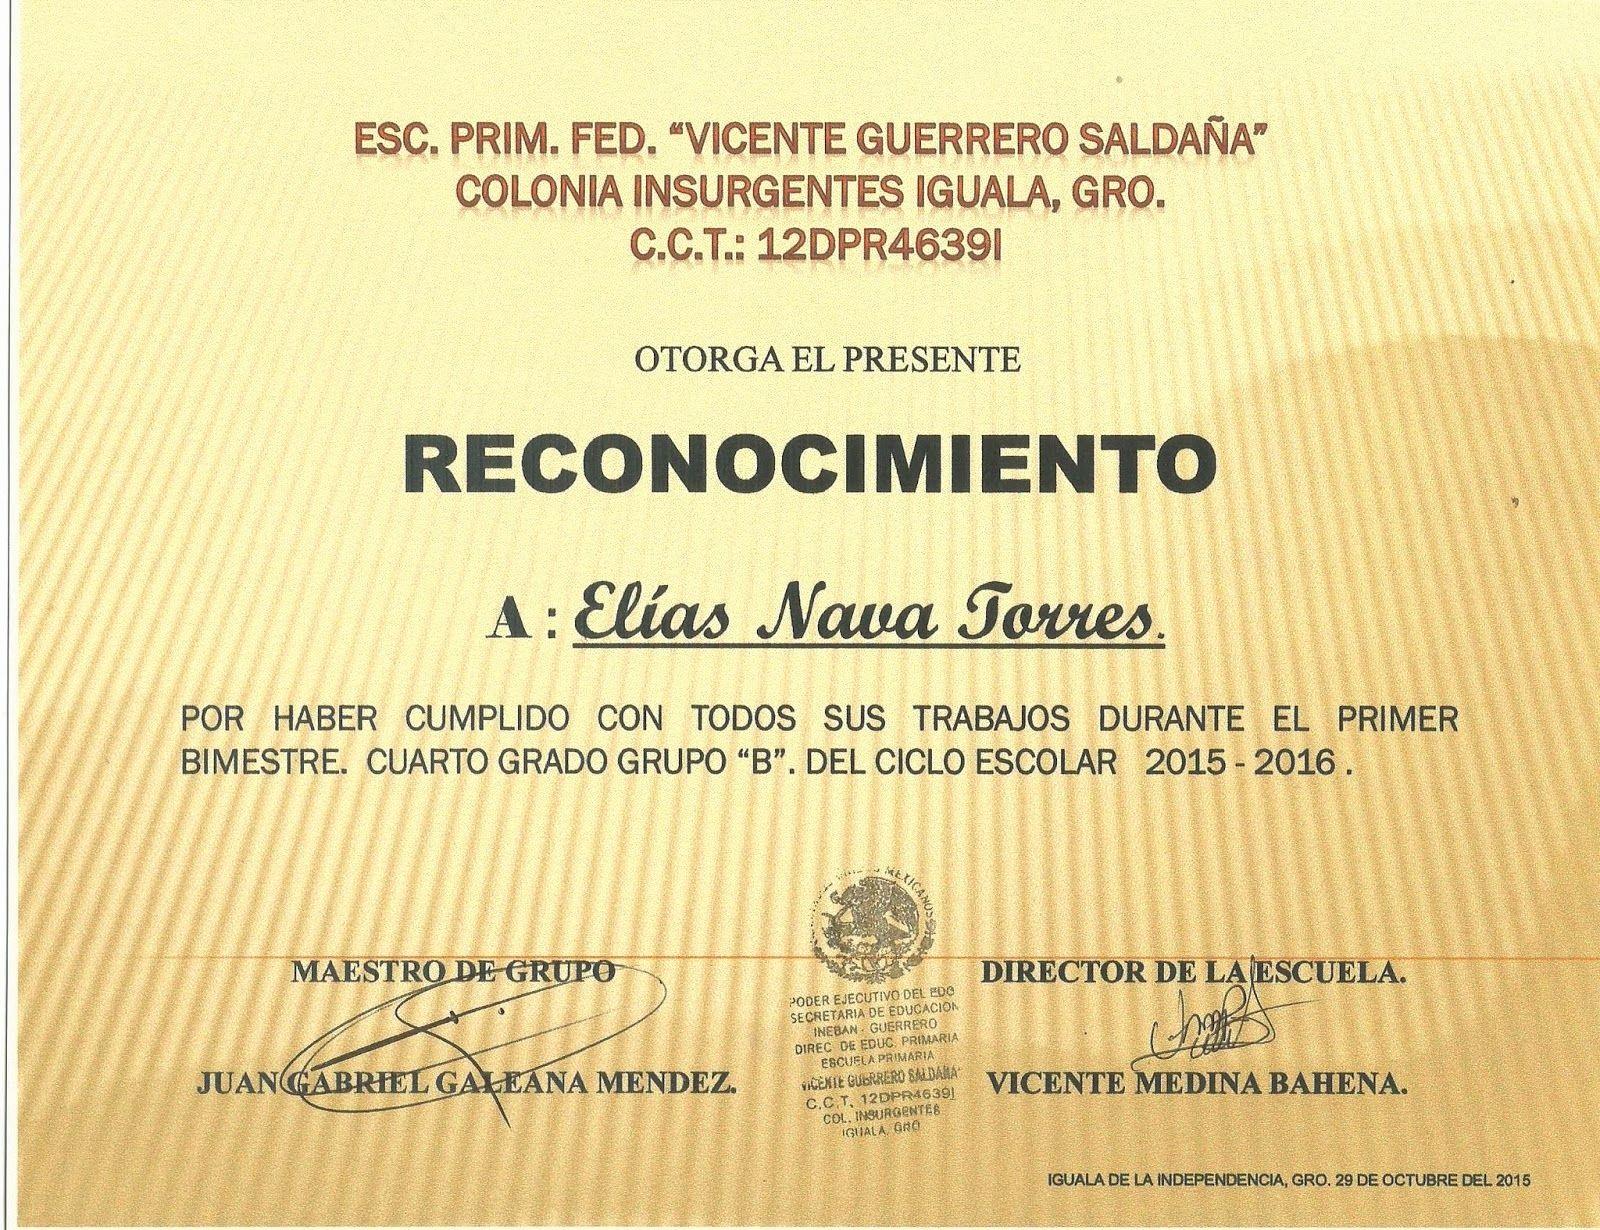 Modelos De Diplomas Para Editar Luxury Resultado De Imagen Para formatos De Diplomas Para Editar